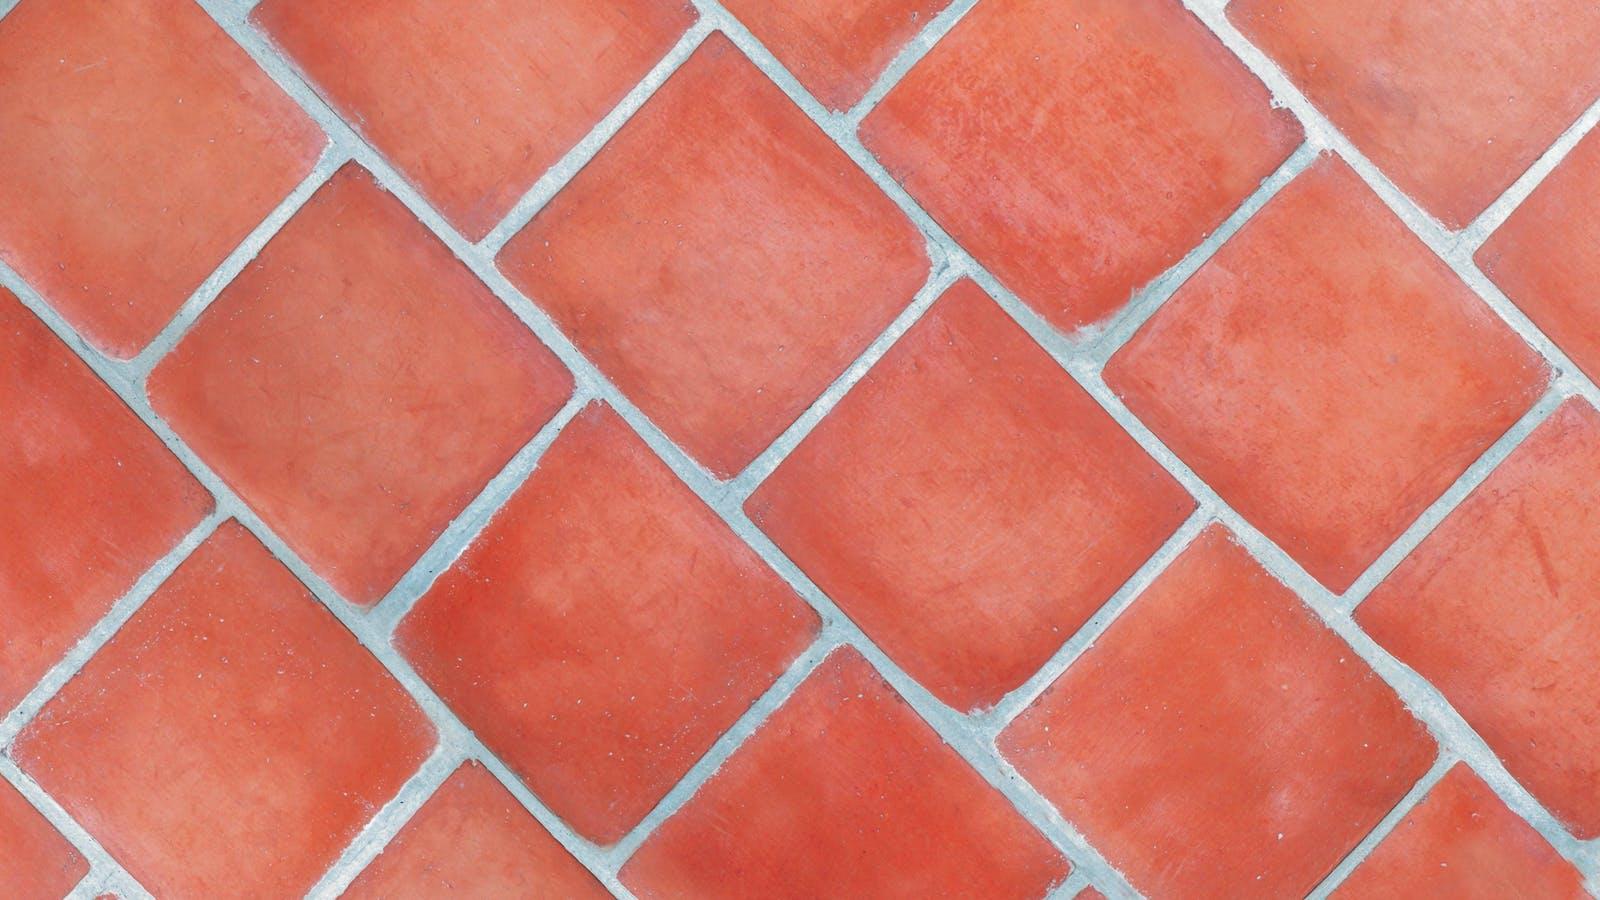 Sevilla New Paving Brick Slip